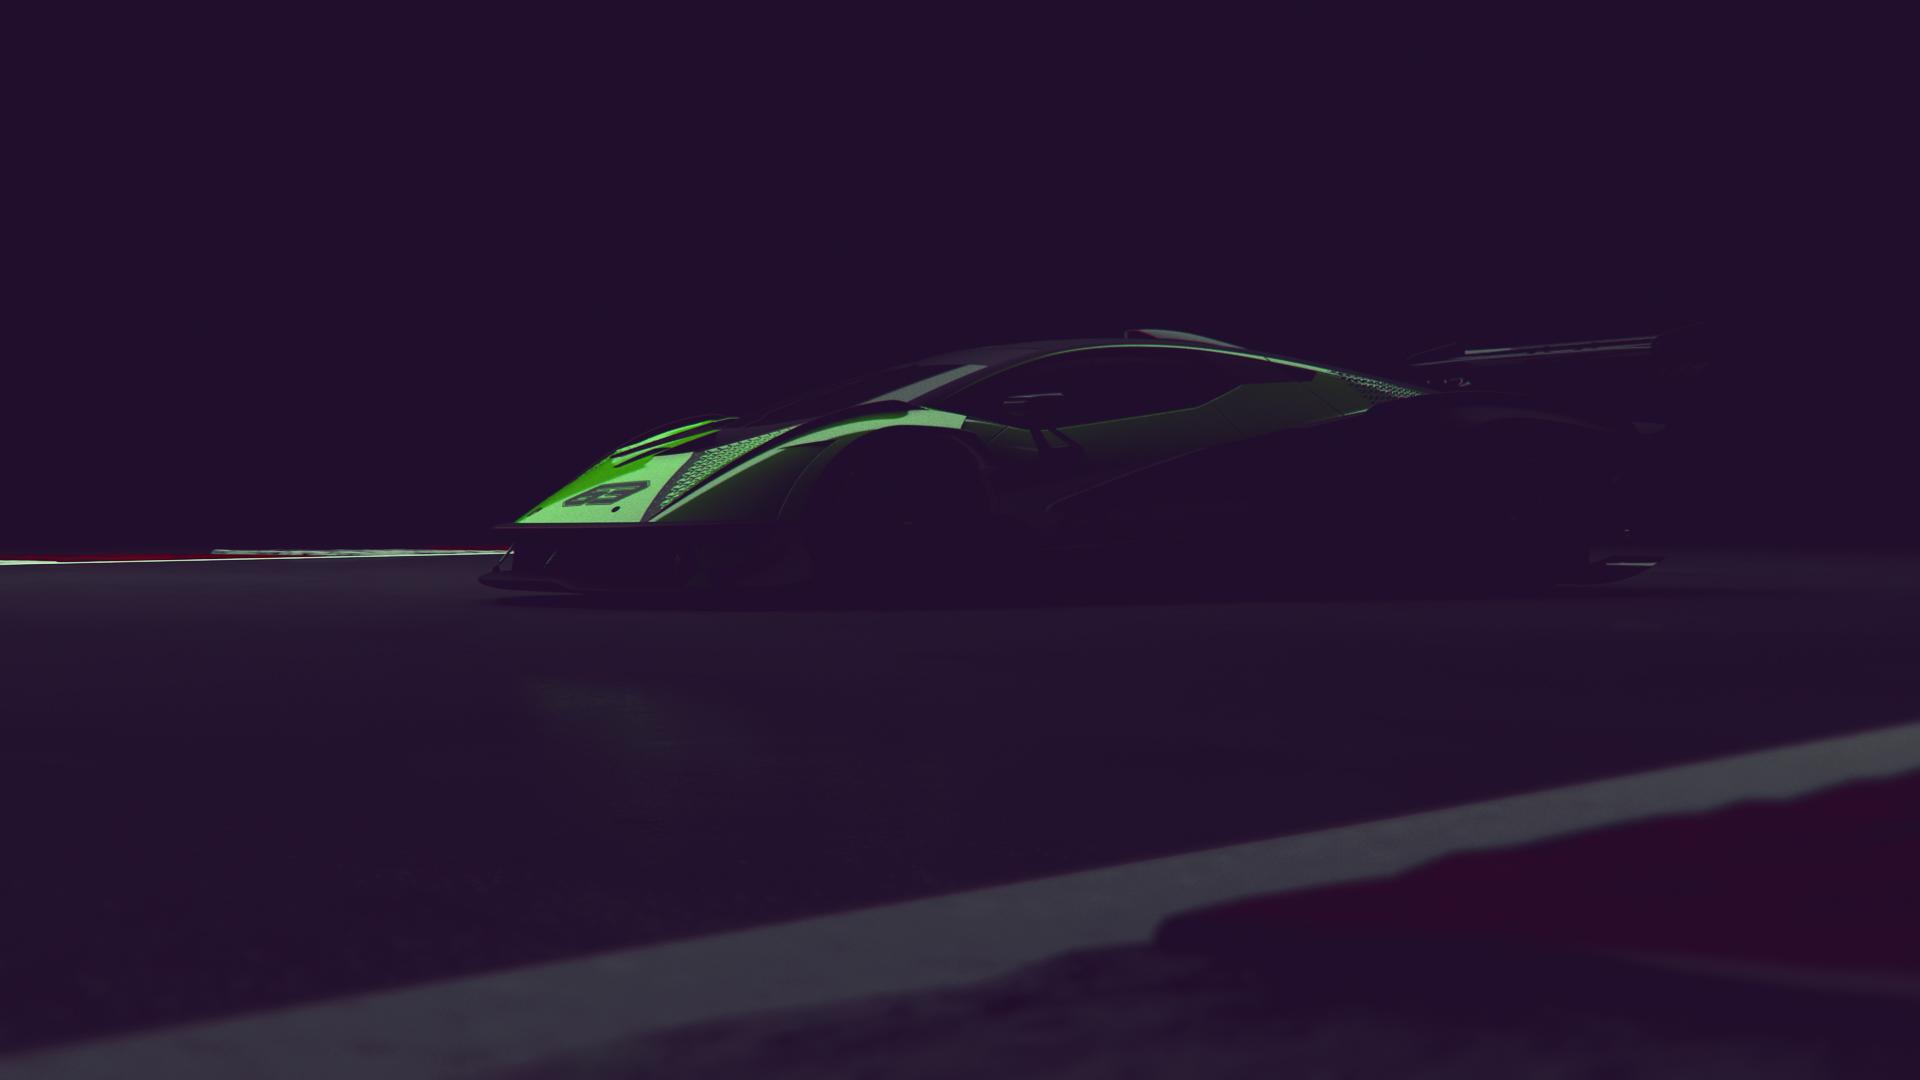 Lamborghini Squadra Corse's 12-cylinder hypercar